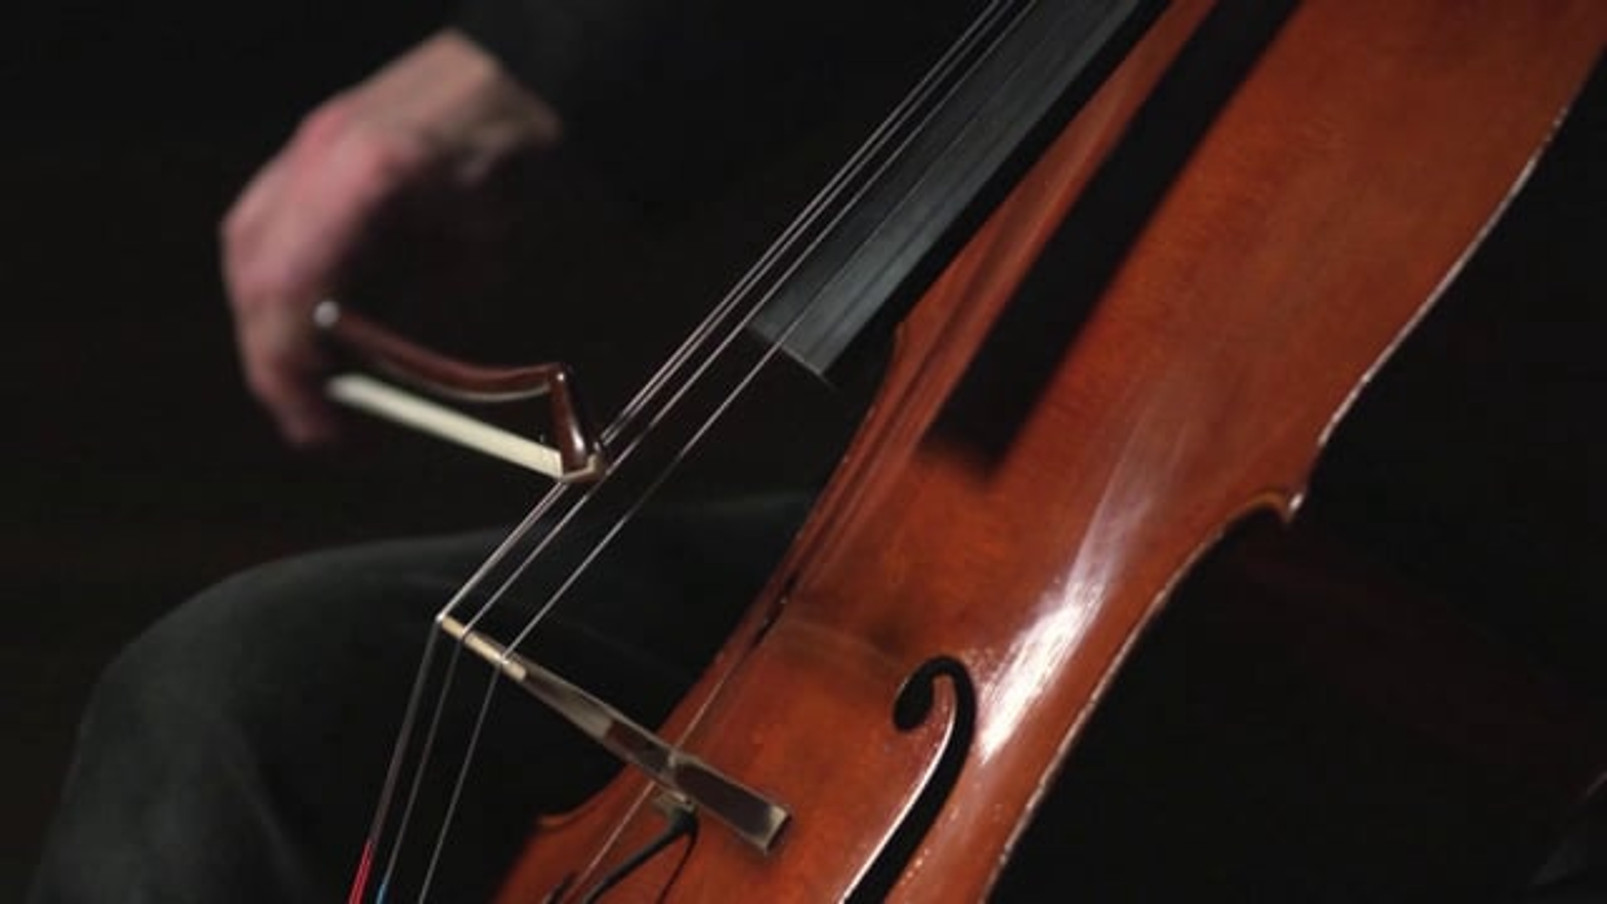 Eugene Friesen   Sarabande in C Minor for cello and looper